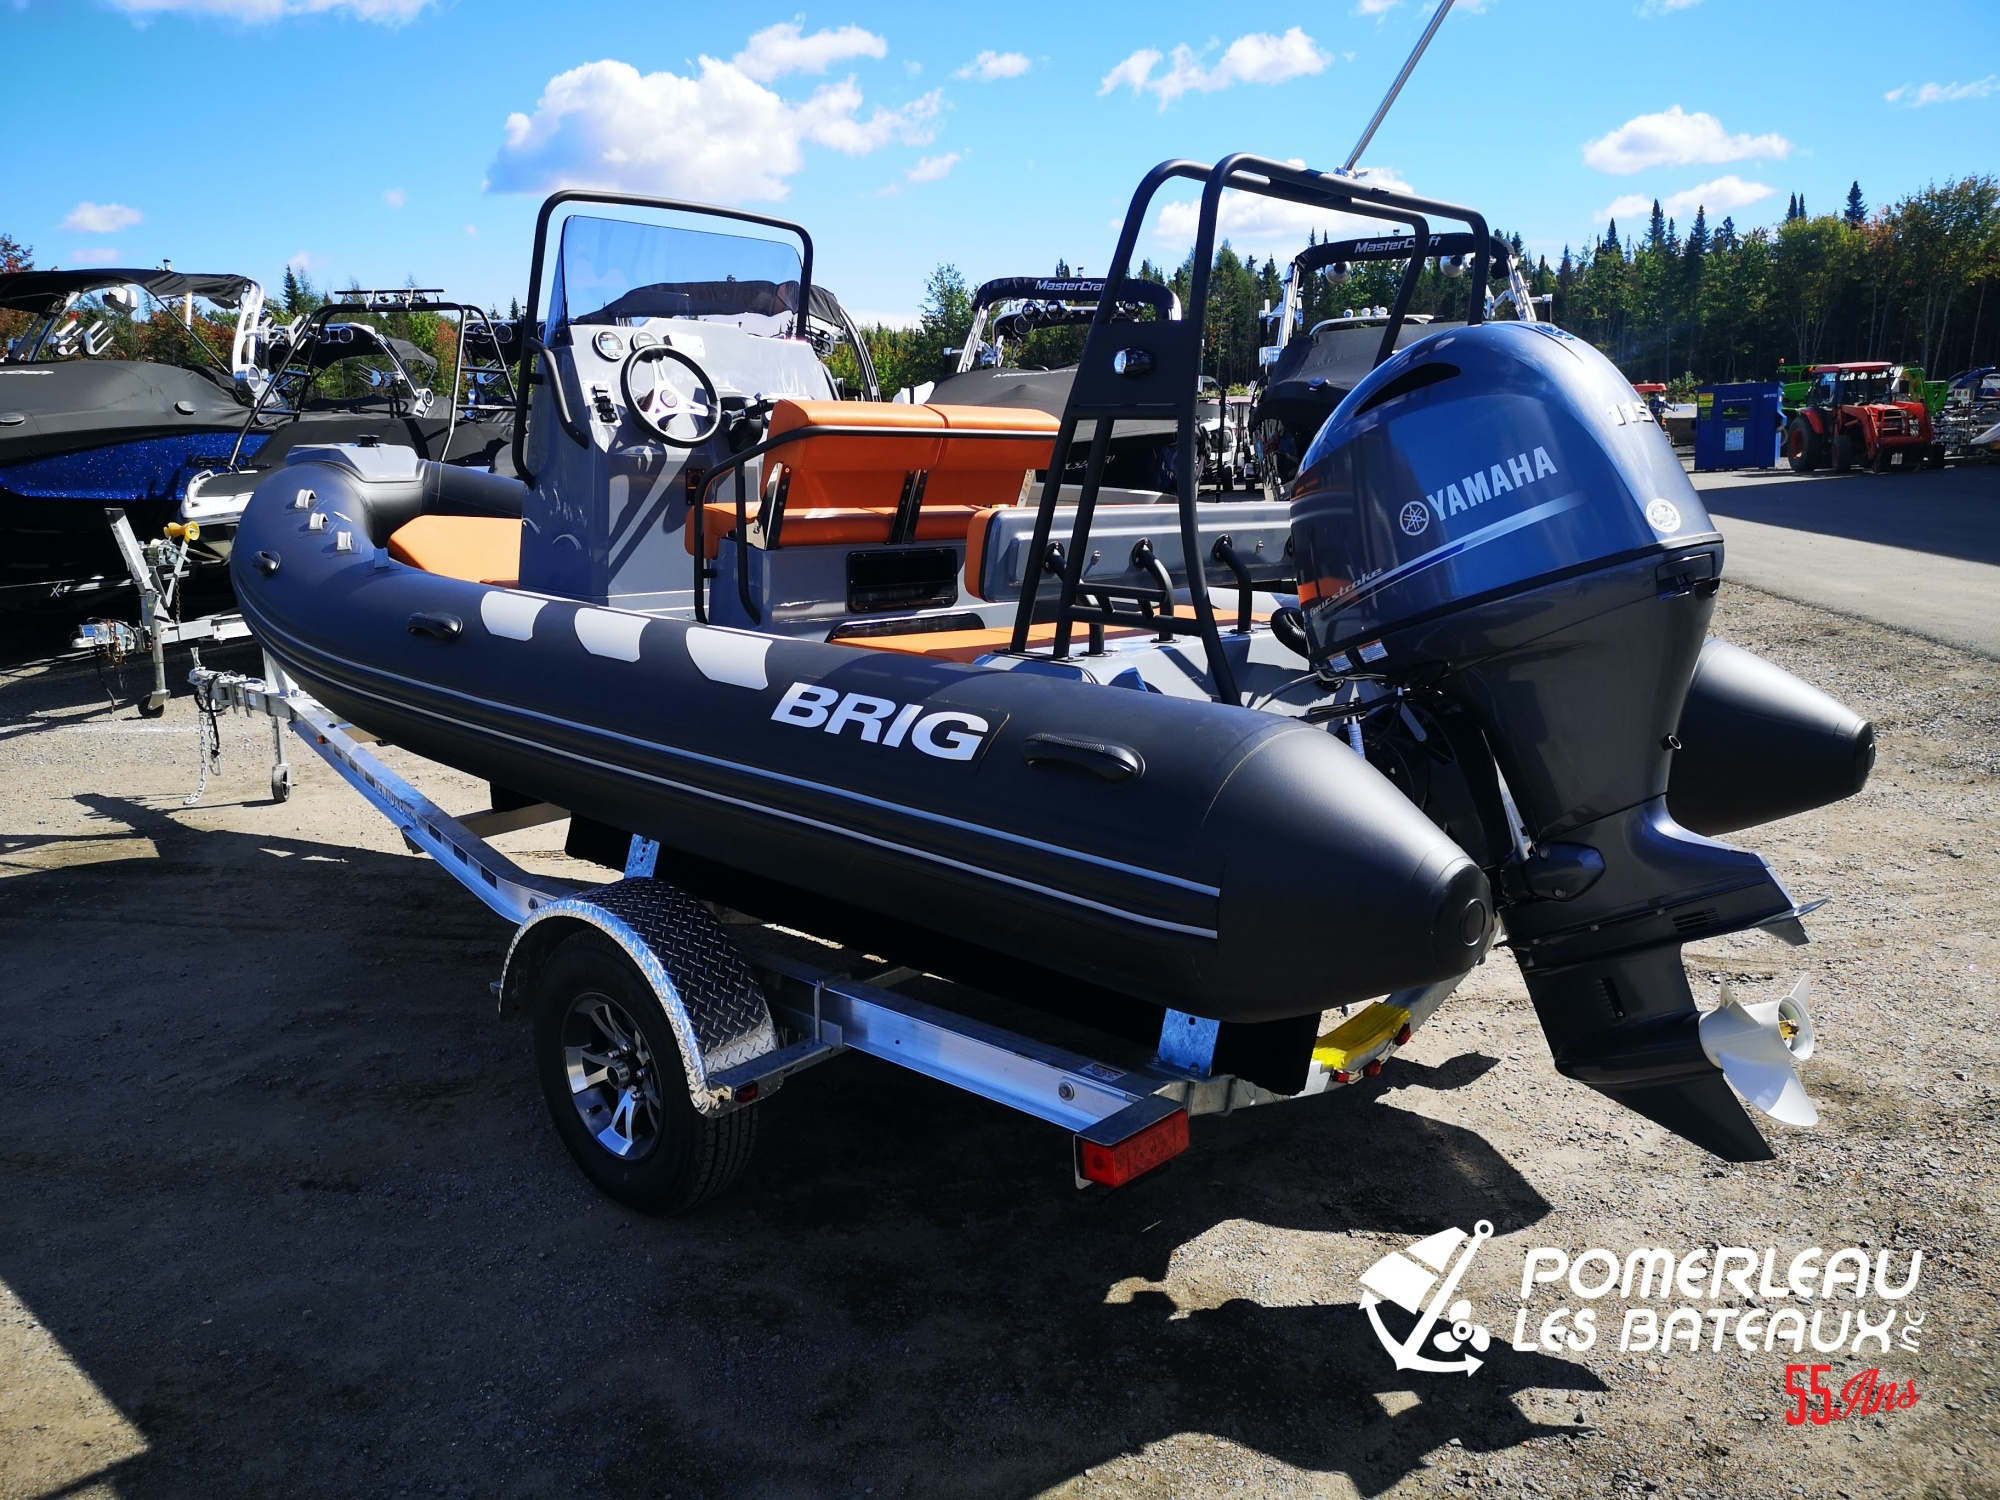 Brig Navigator 570 - IMG_20210916_132144